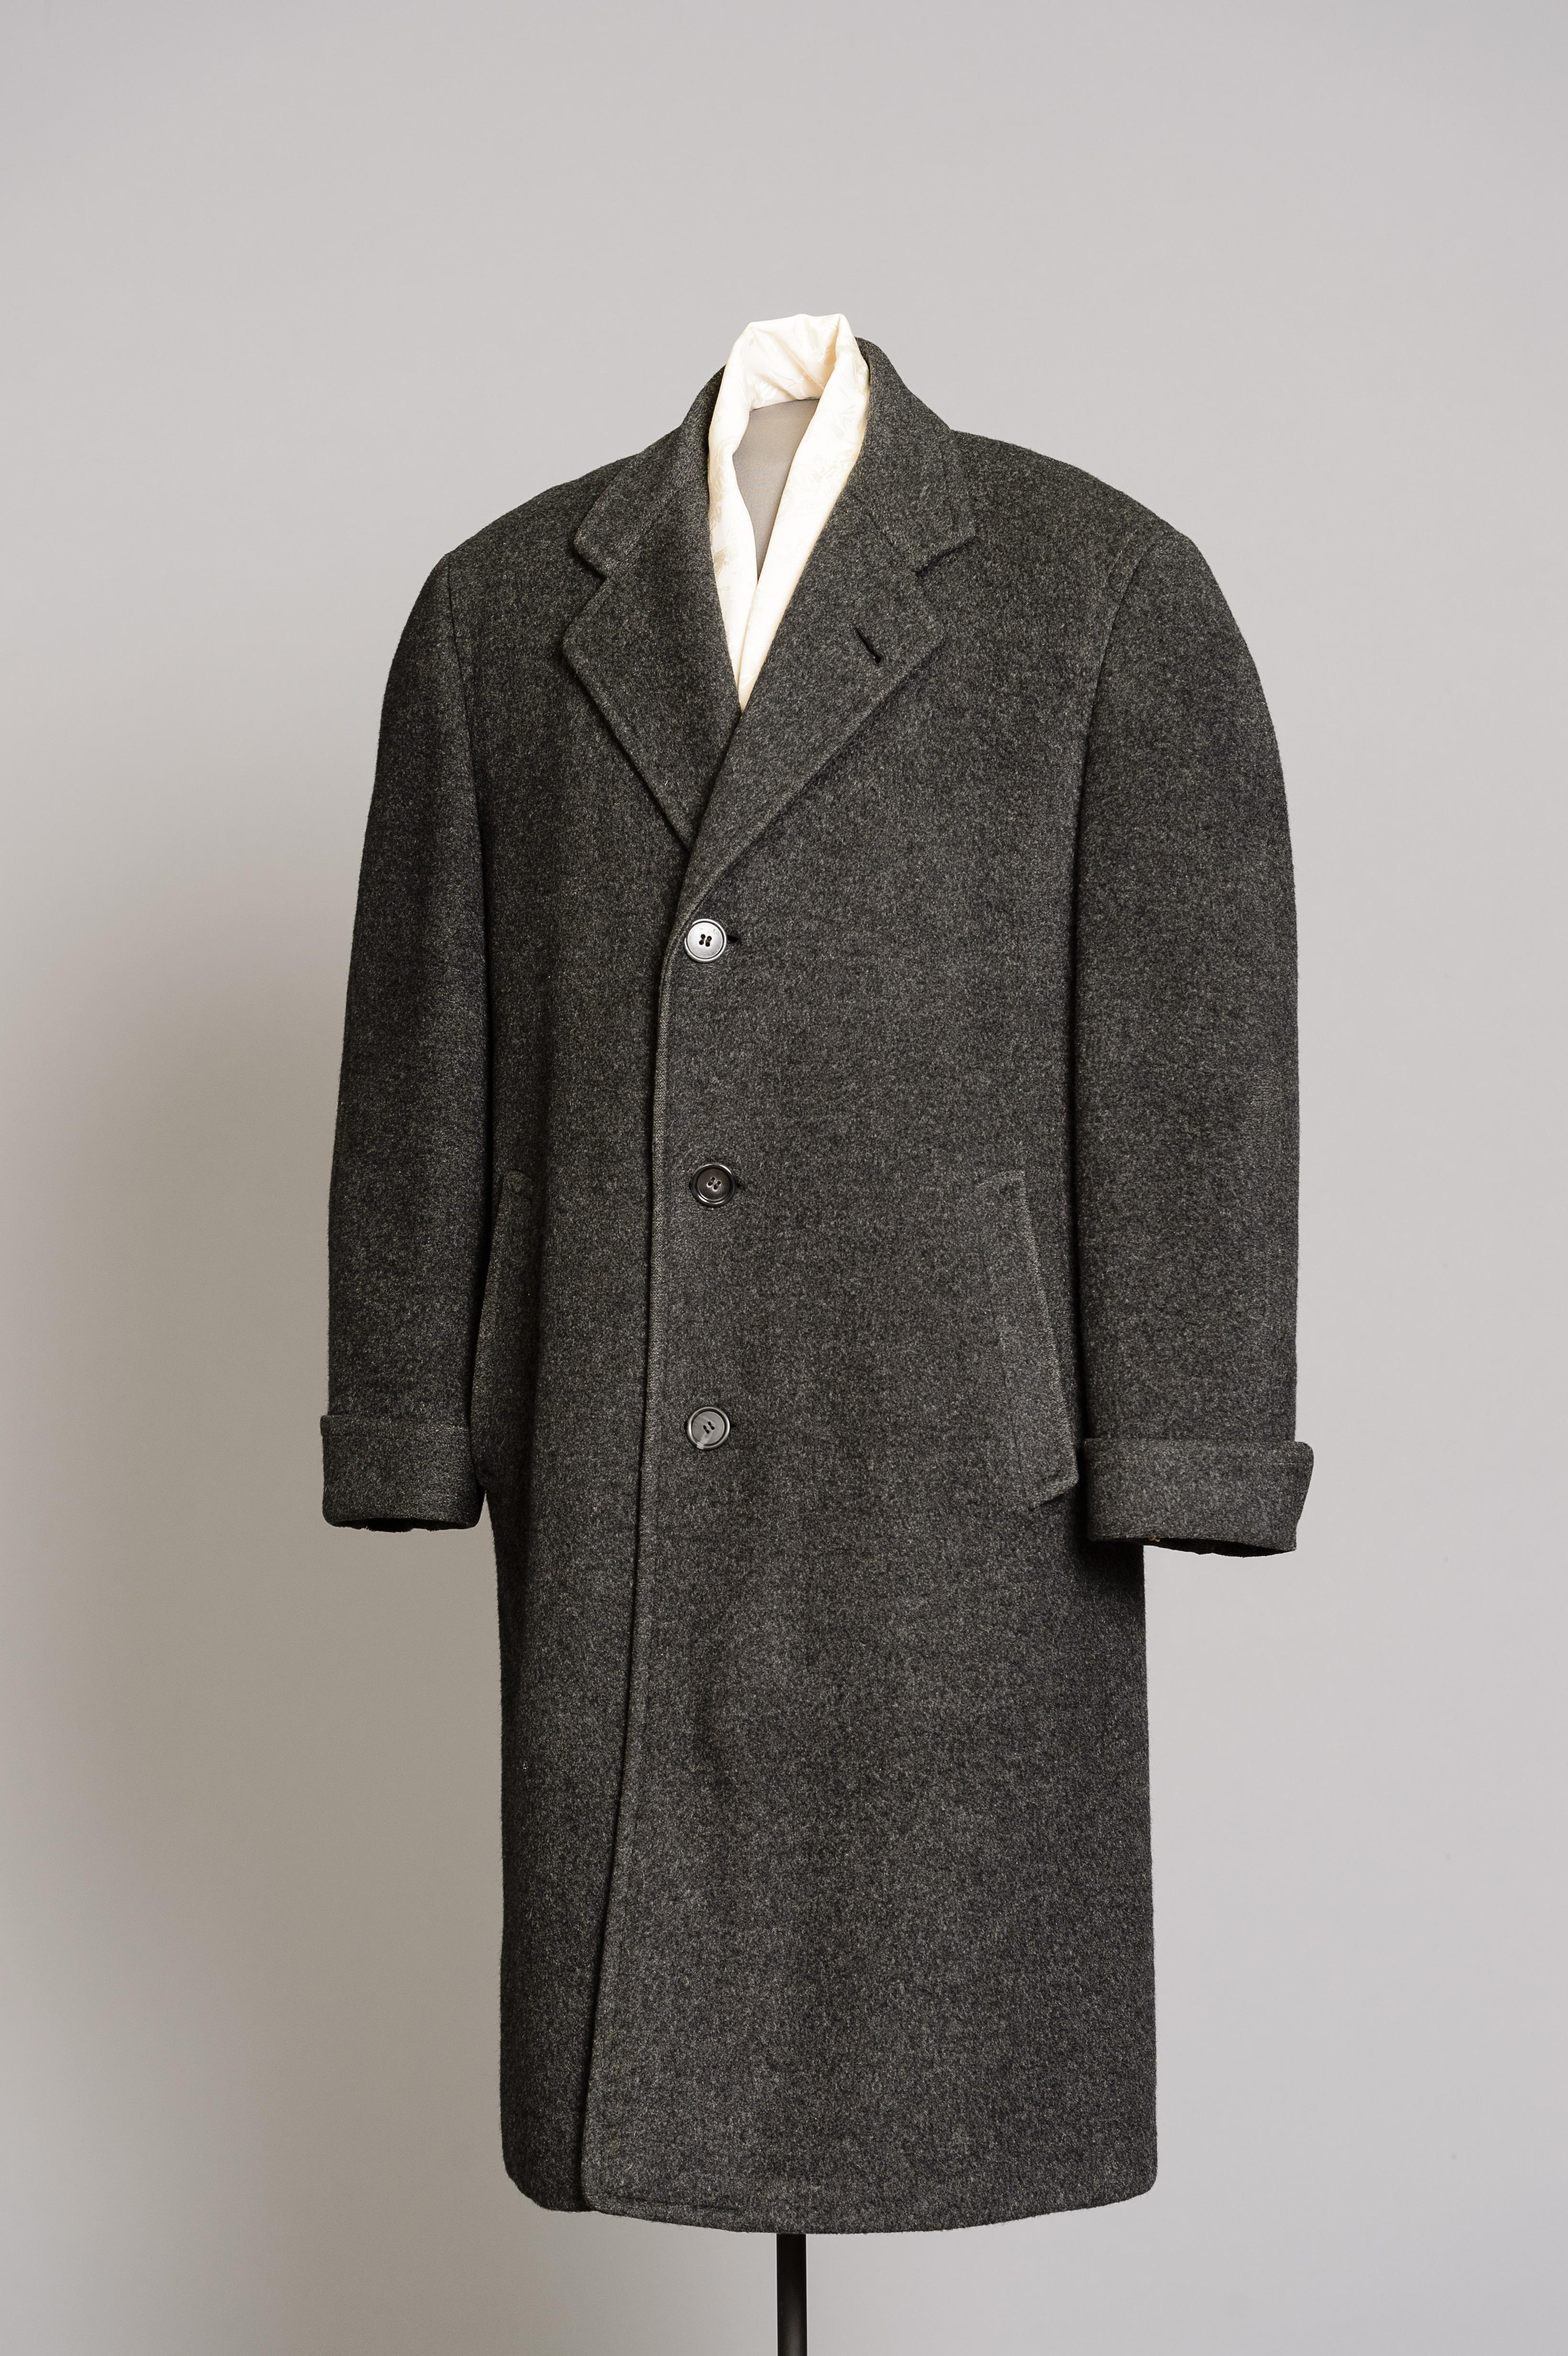 Fashion and Satire: Men's Overcoat